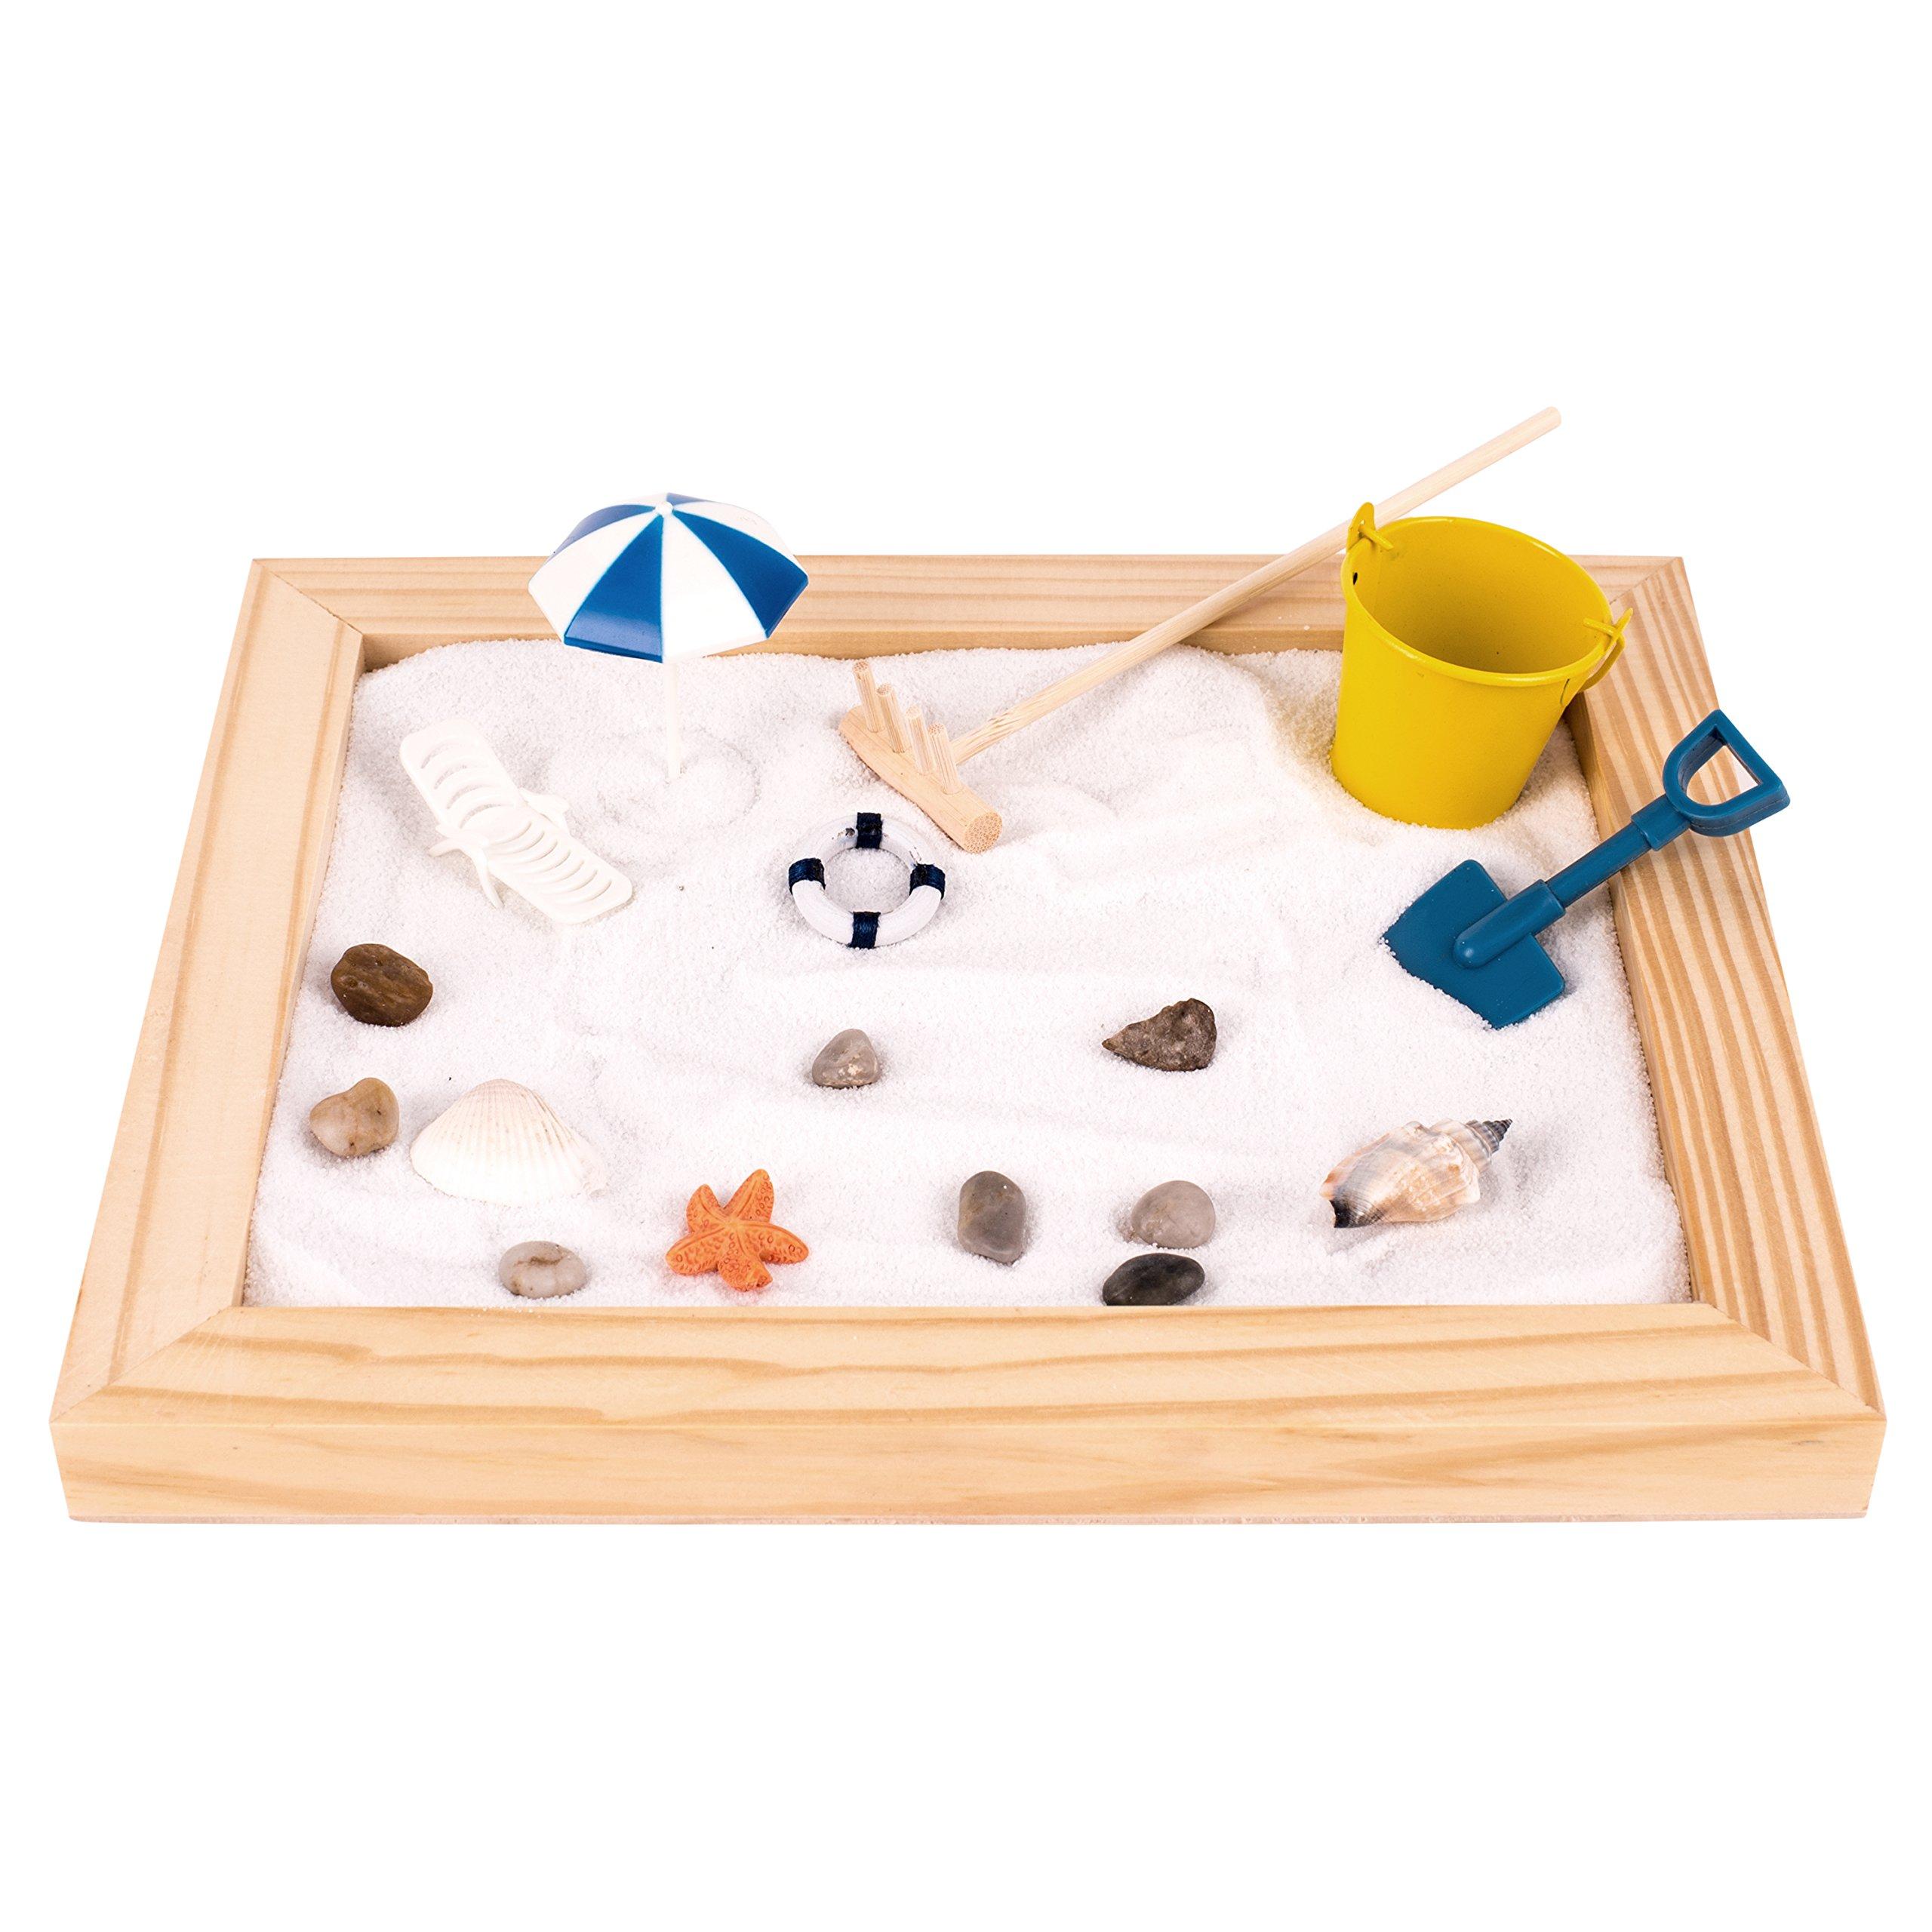 Deluxe Wooden Zen Sand Garden with Beach Toys, Shells, Rocks, Sand, and Rake (Model# RG-005)